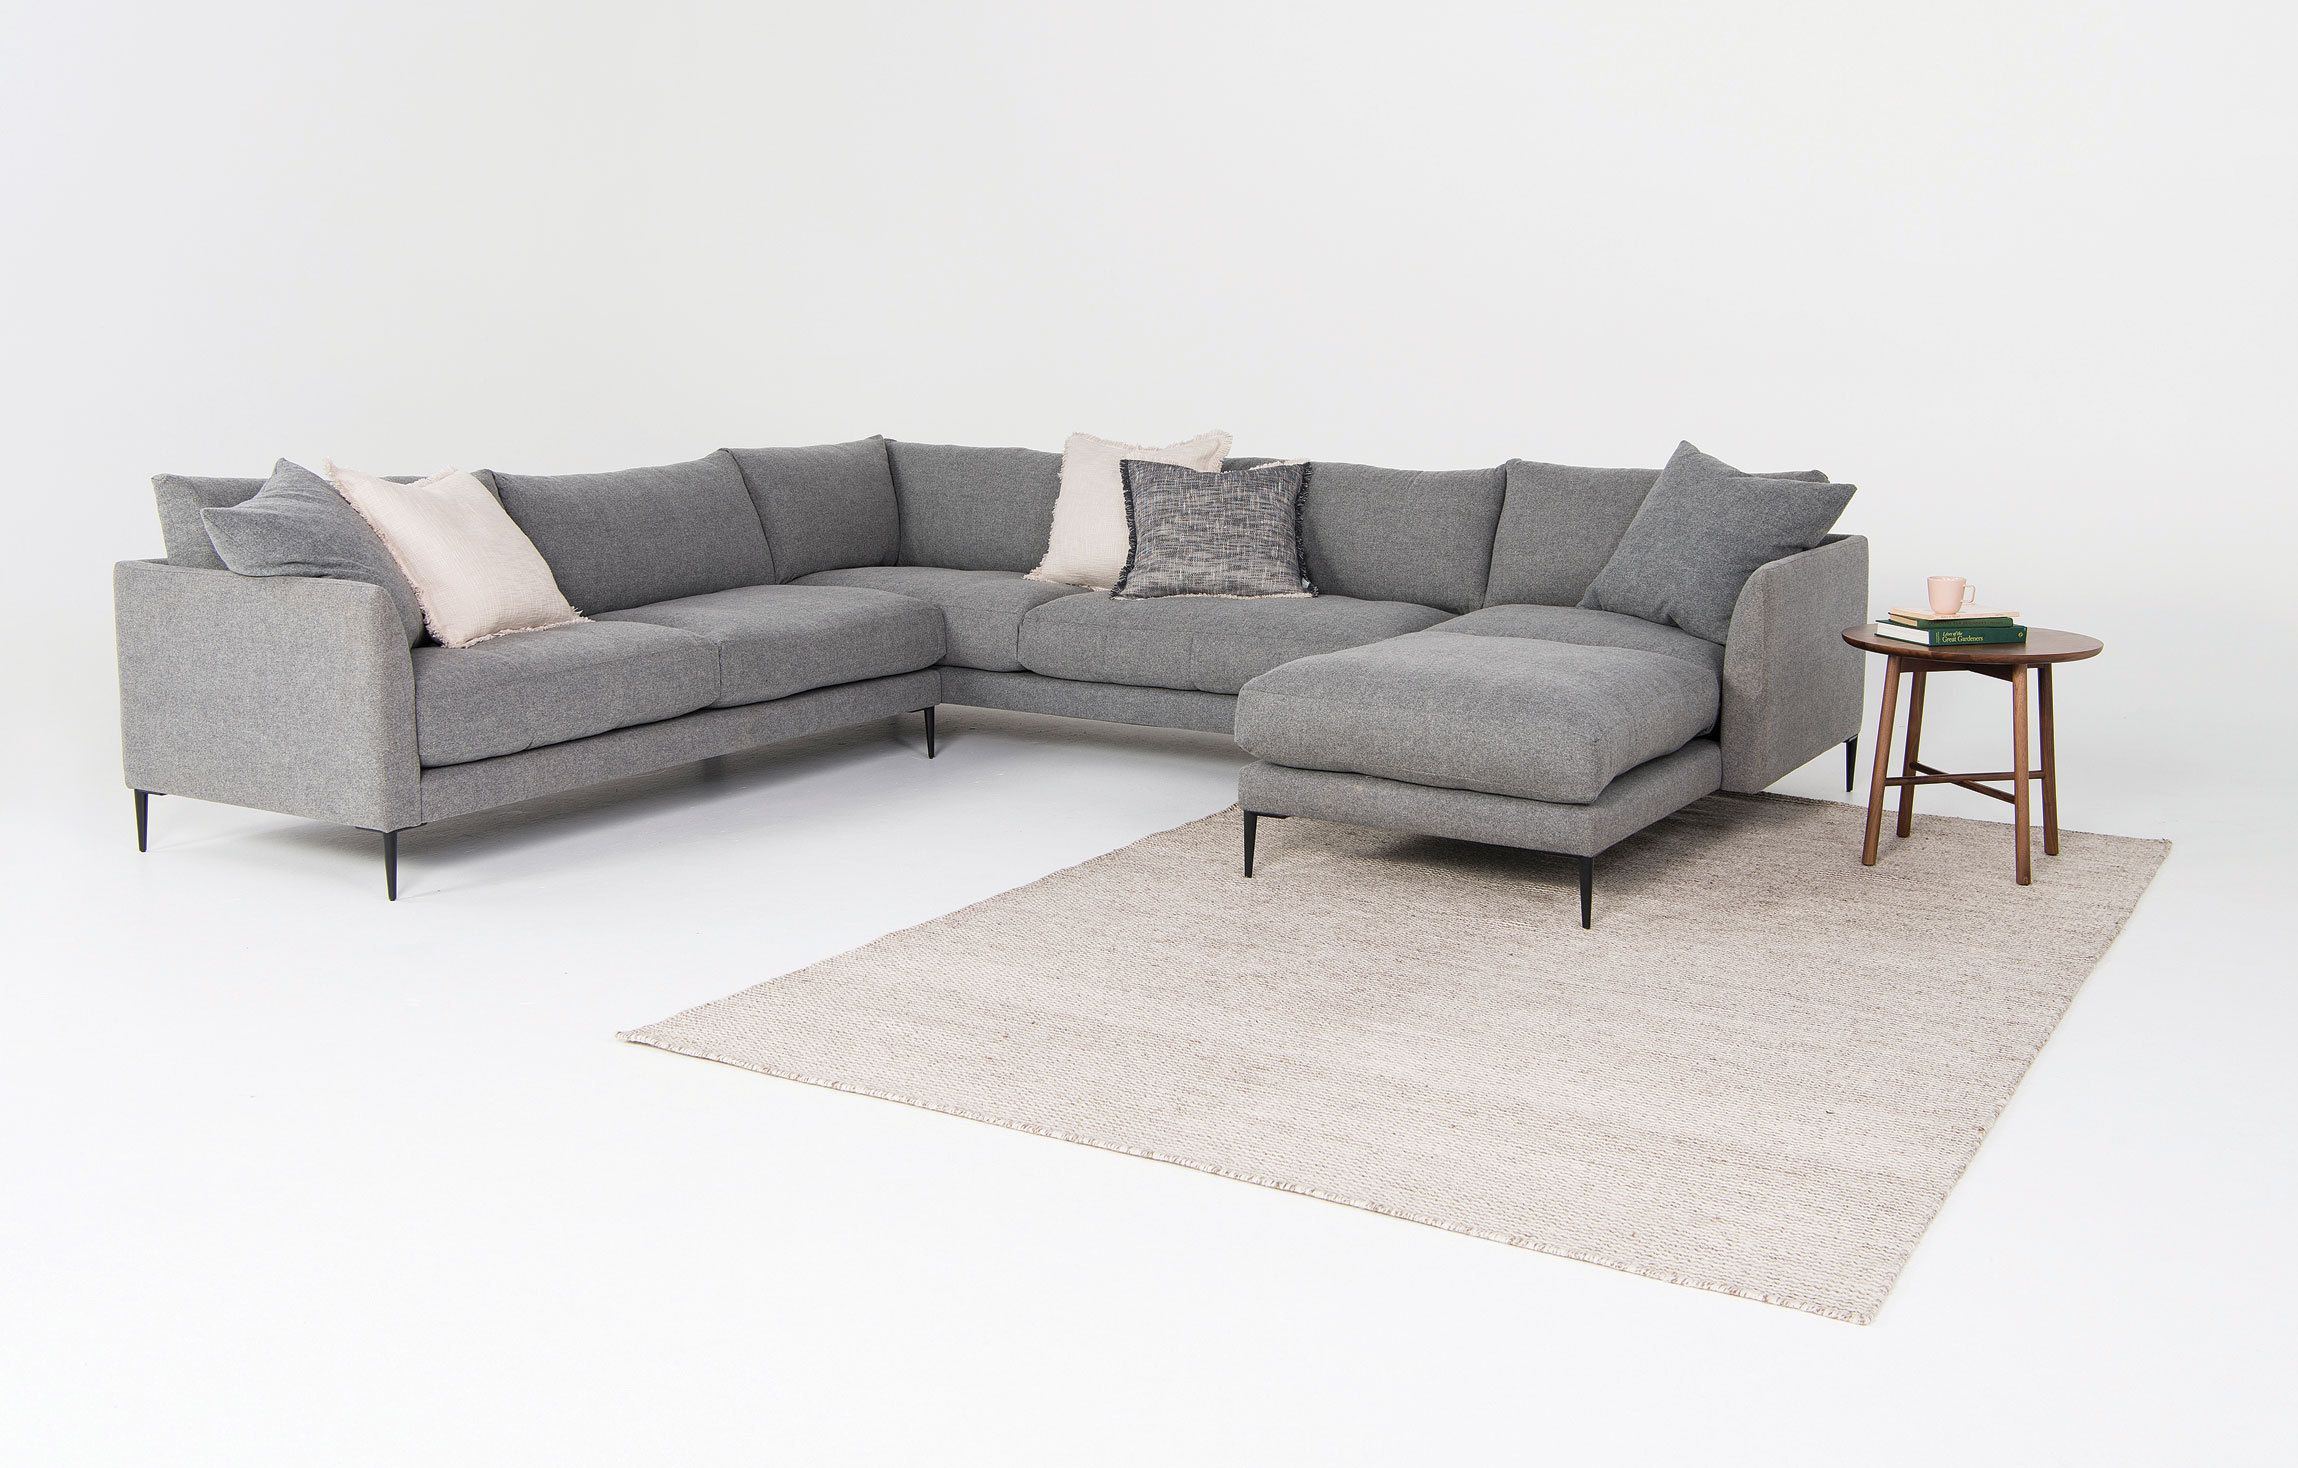 Eve Corner 7 Jpg With Images Furniture Modular Sofa Furniture Design